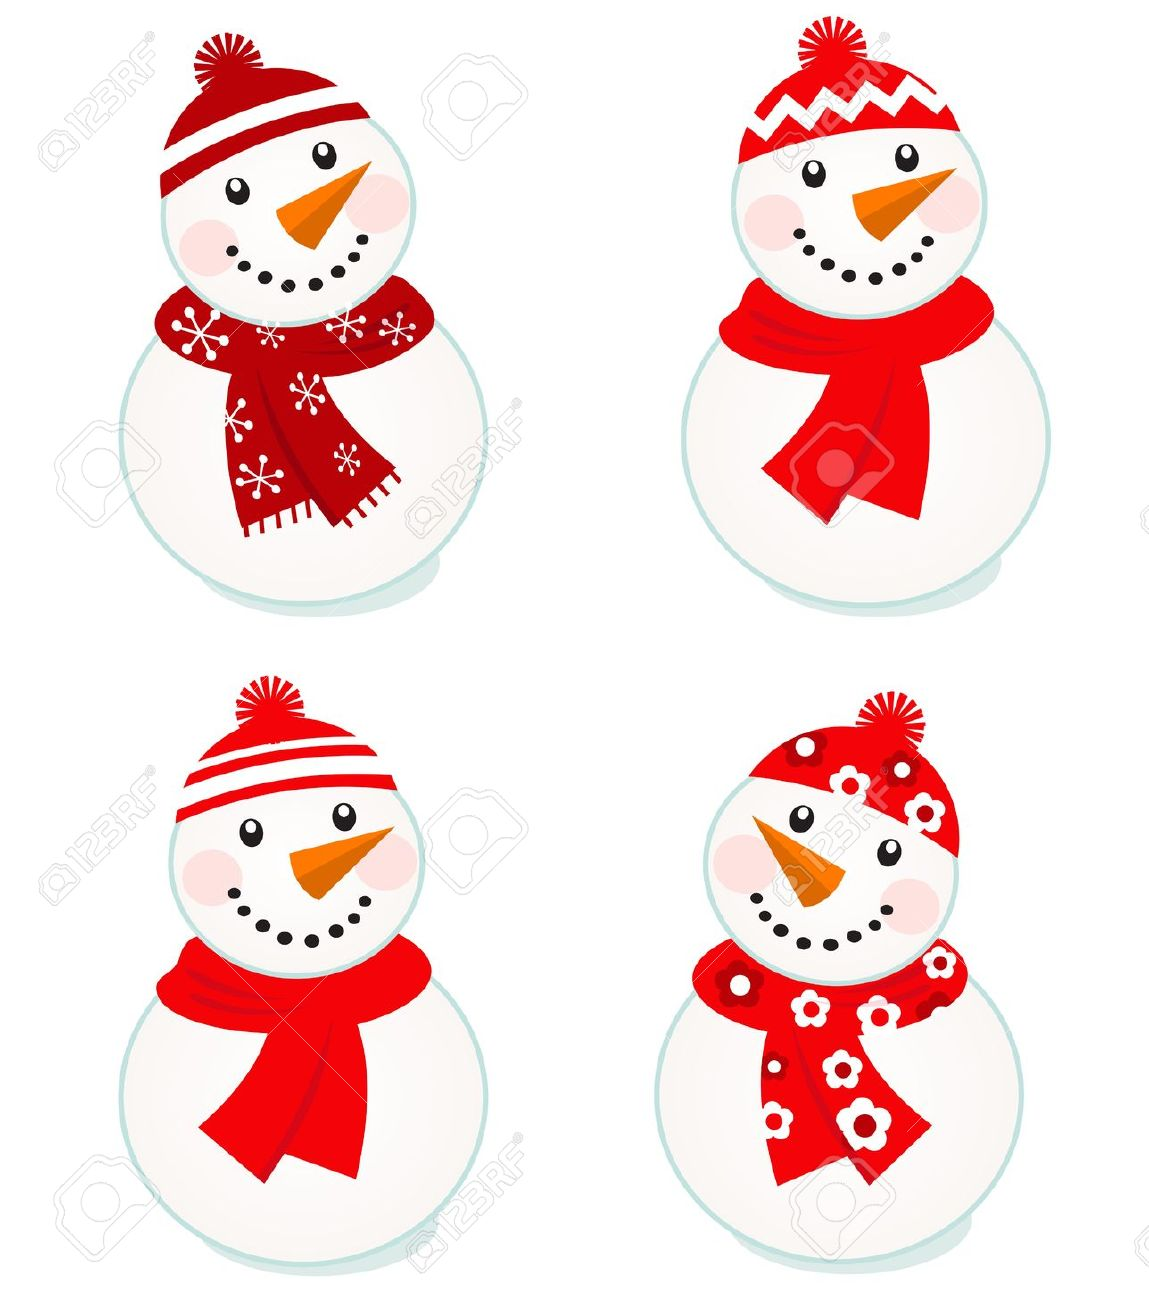 Frosty The Snowman: Vector .-frosty the snowman: Vector .-13